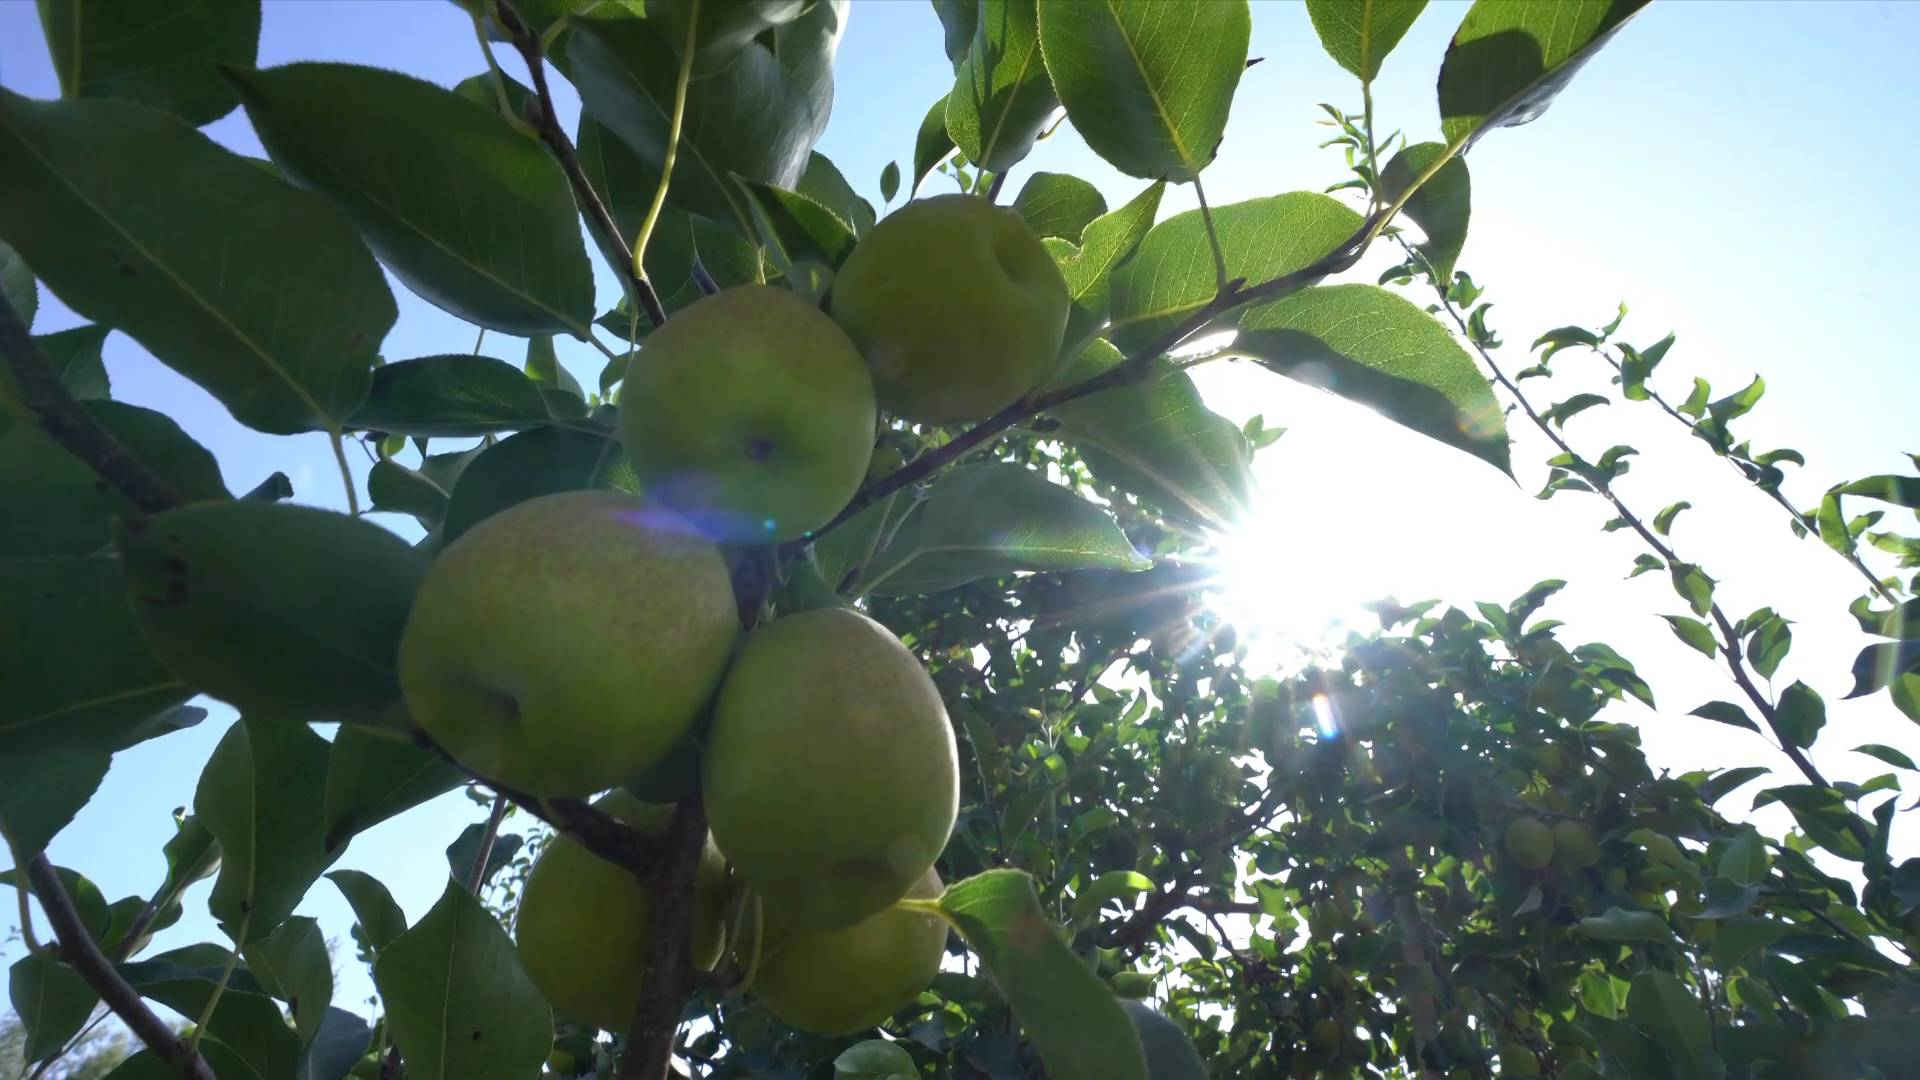 GLOBALink | Xinjiang's fragrant pears usher in the harvest season